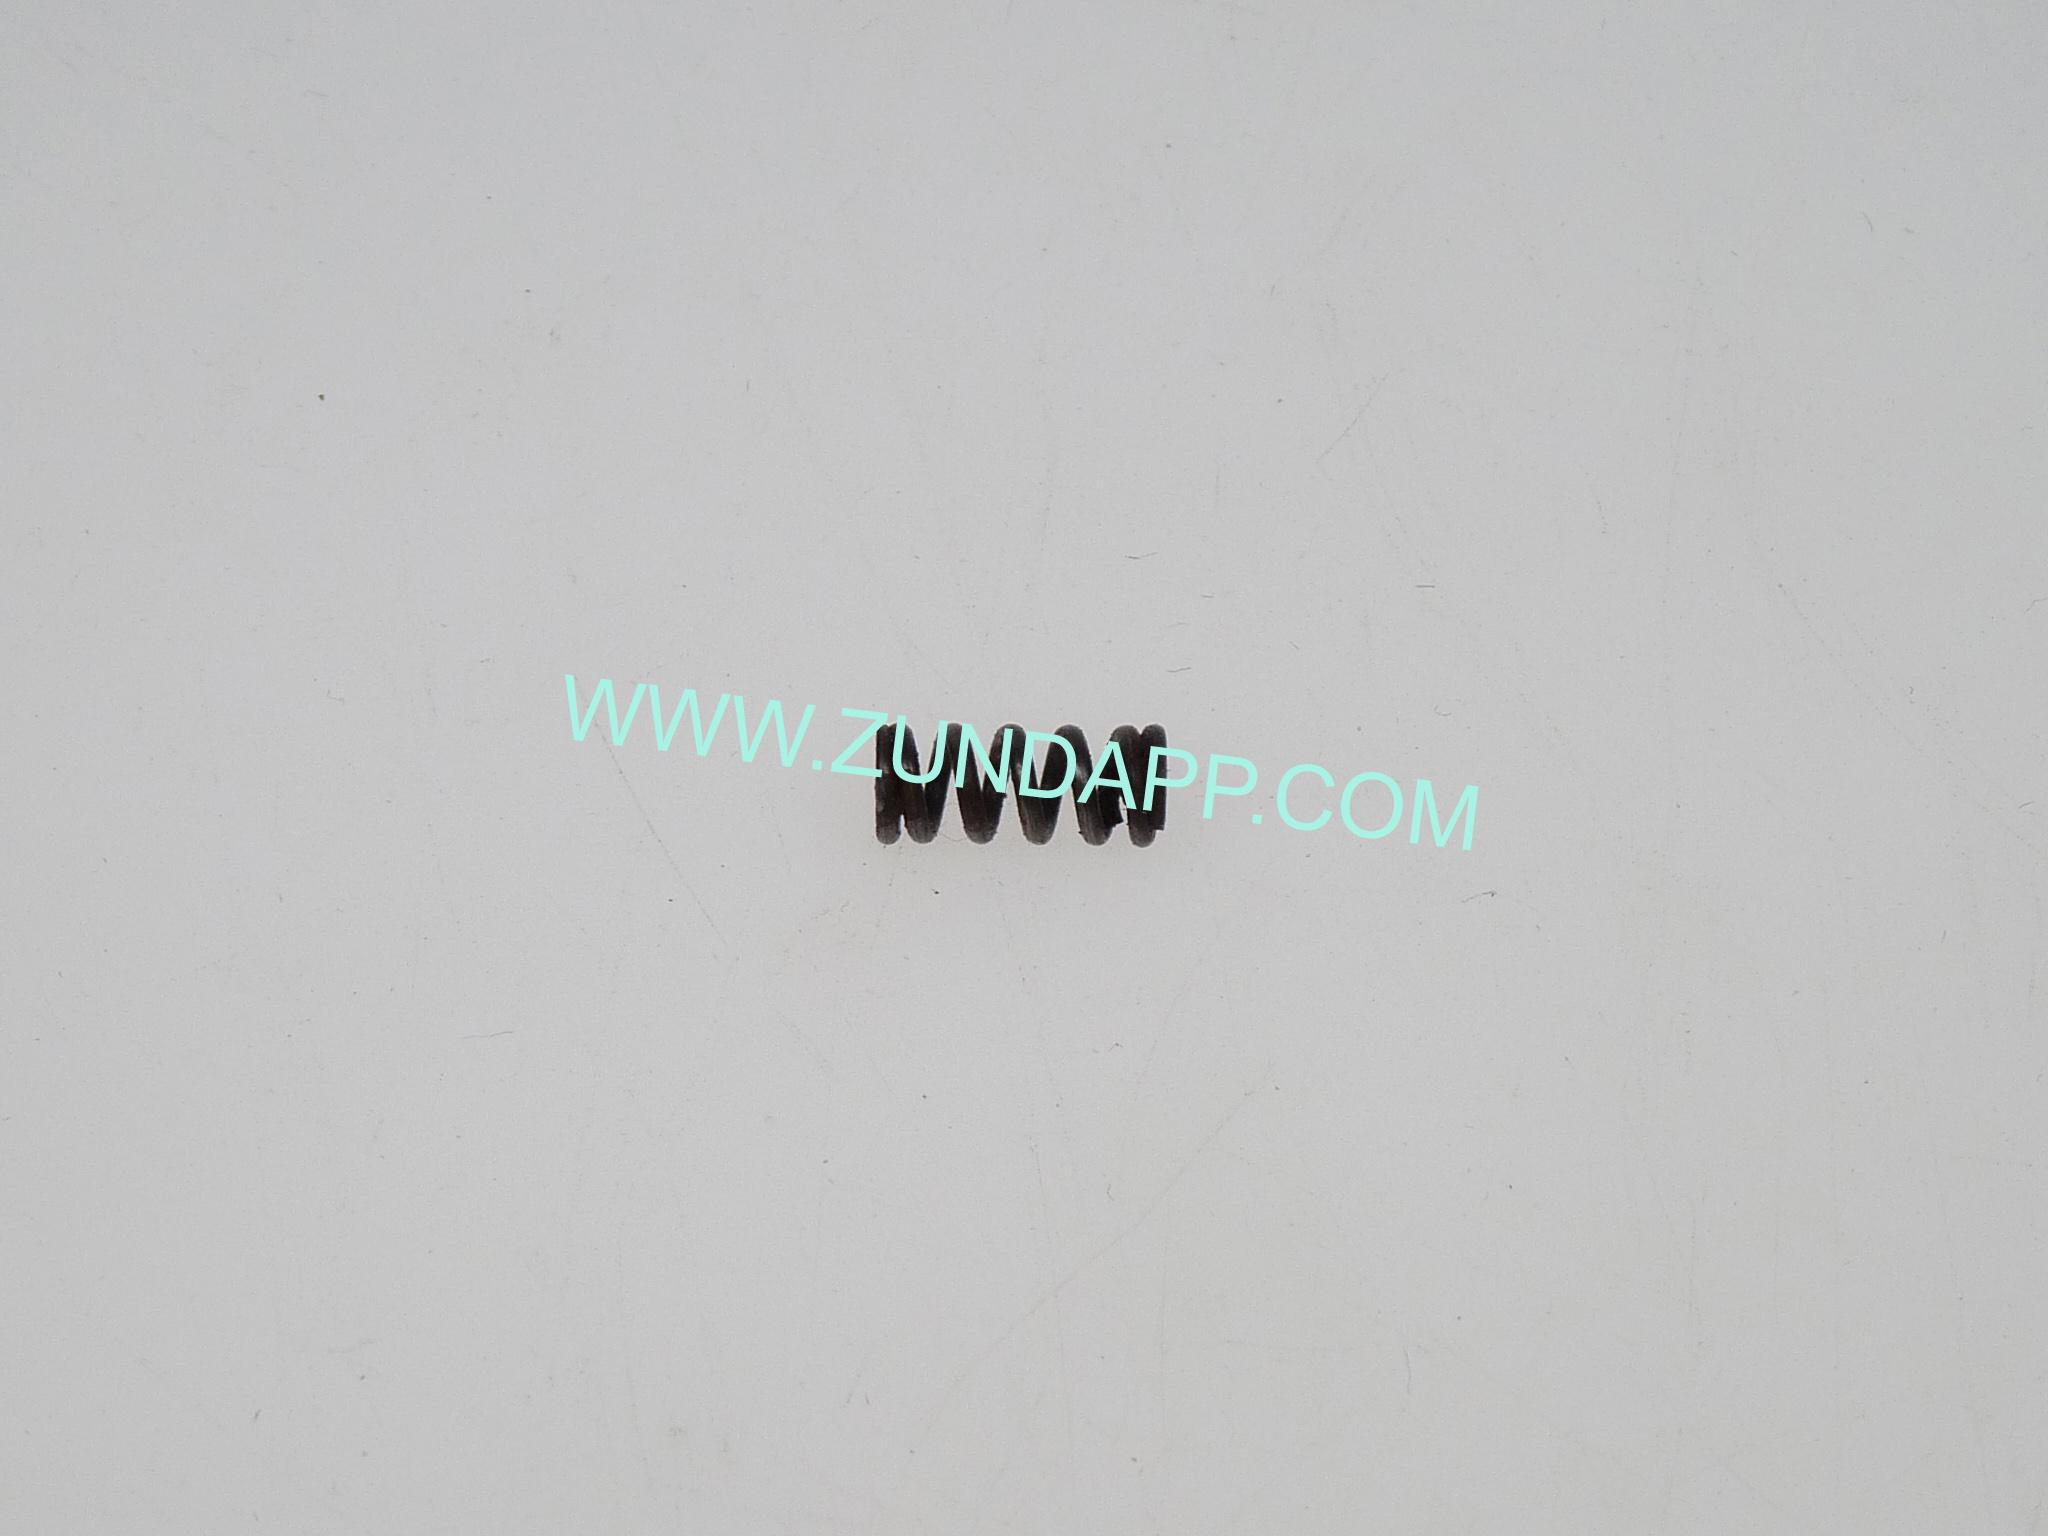 Drukveer Aanslagbout Zundapp Parts Webshop